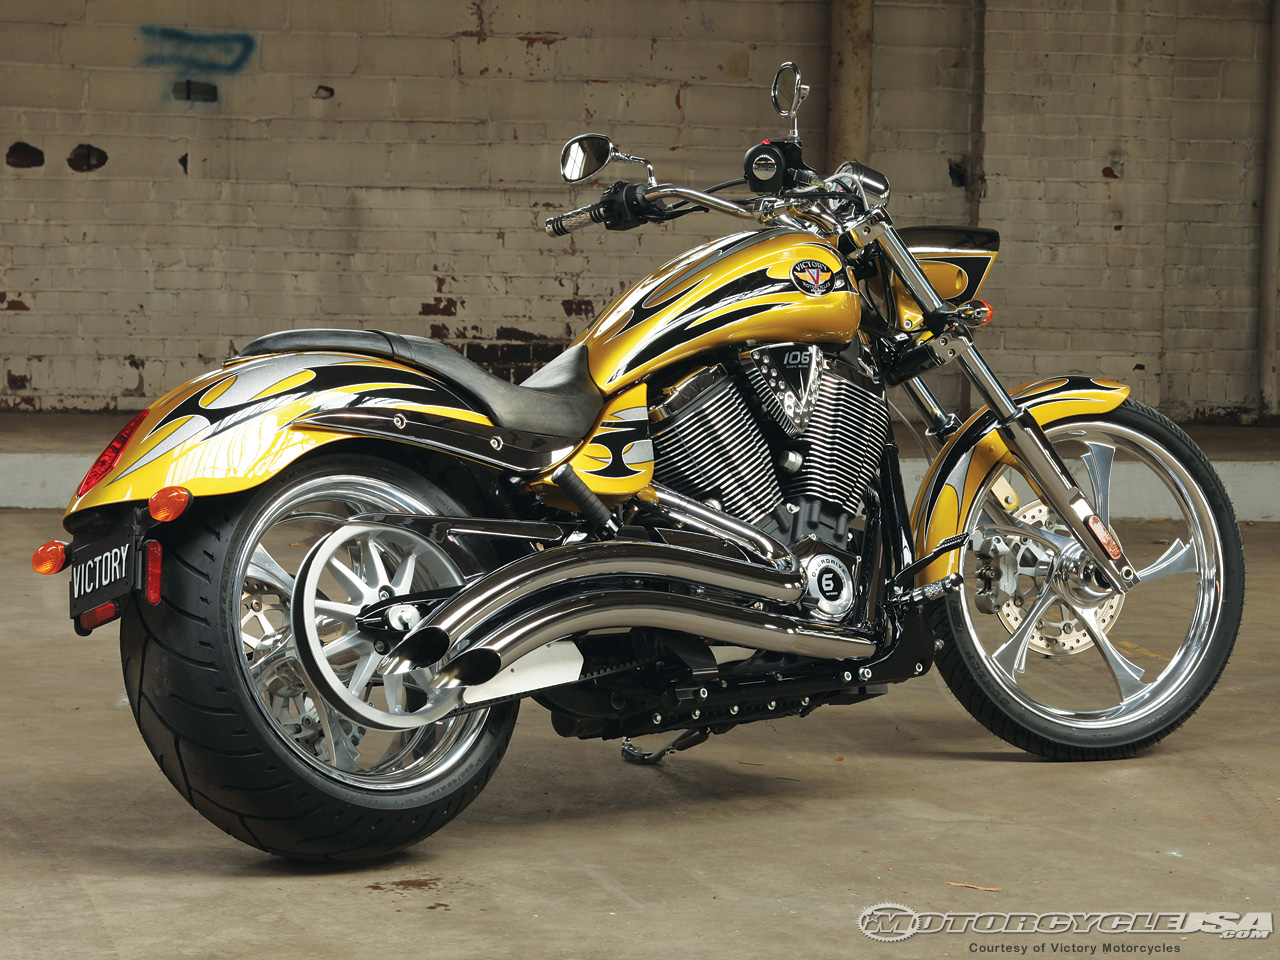 motorcycle wallpaper Victory Motorcycle Wallpaper 1280x960